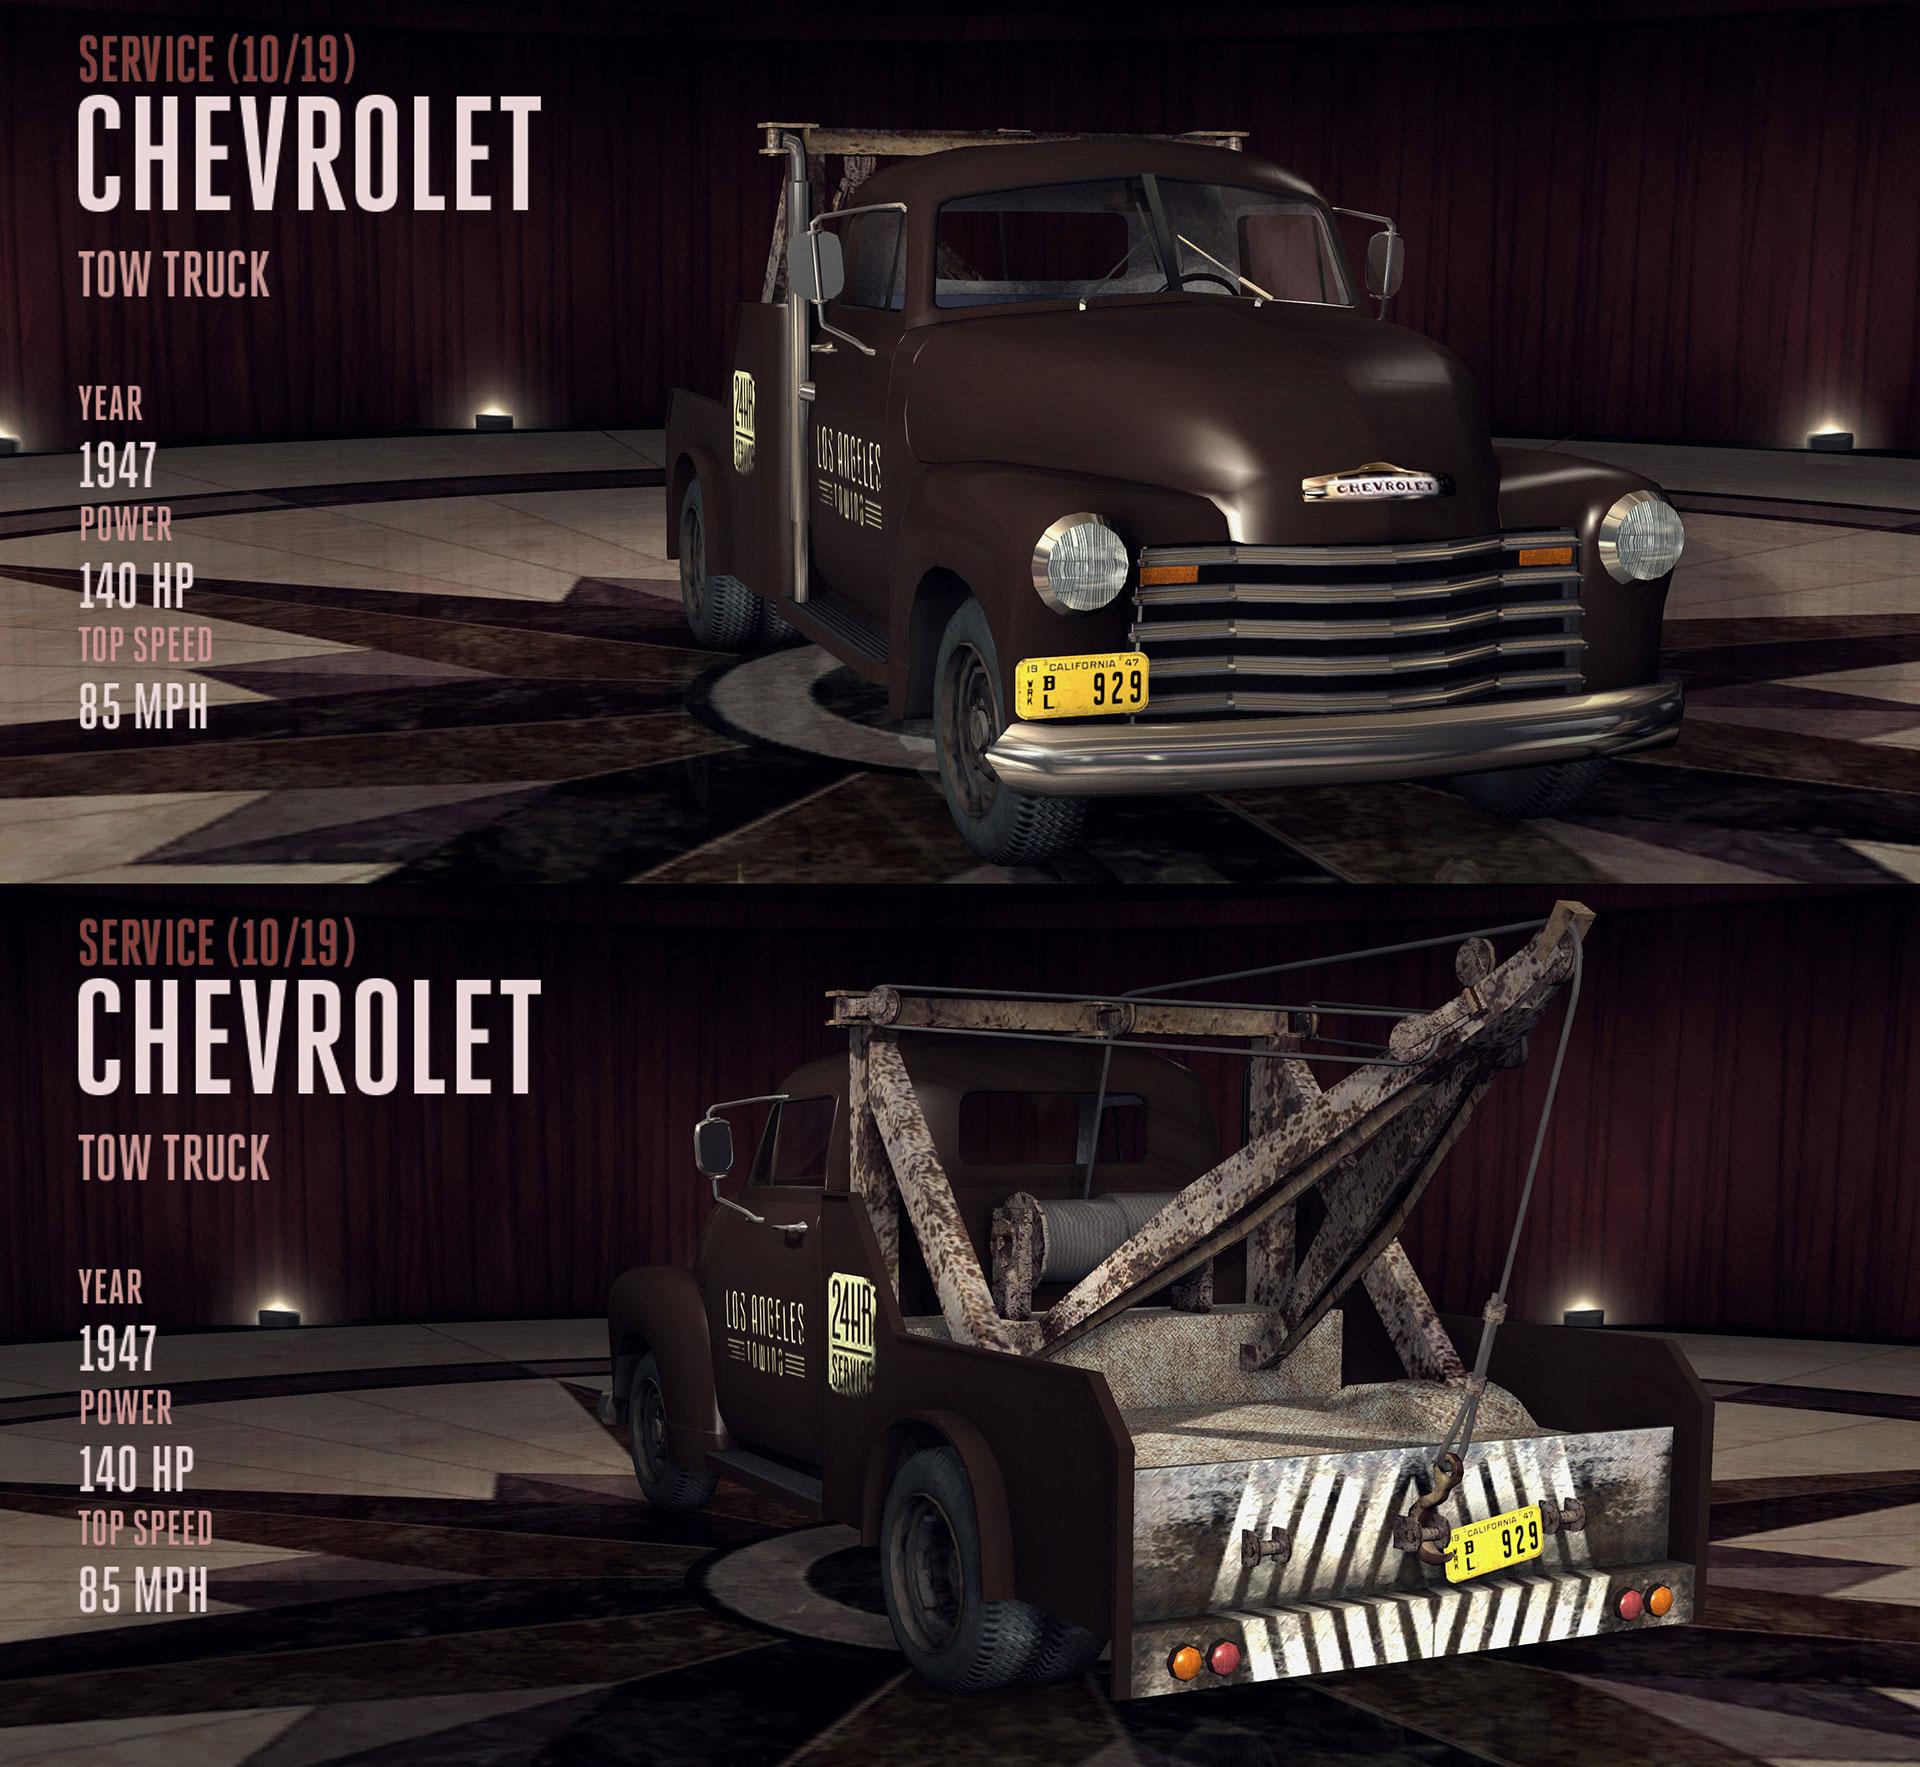 File:1947-chevrolet-tow-truck.jpg